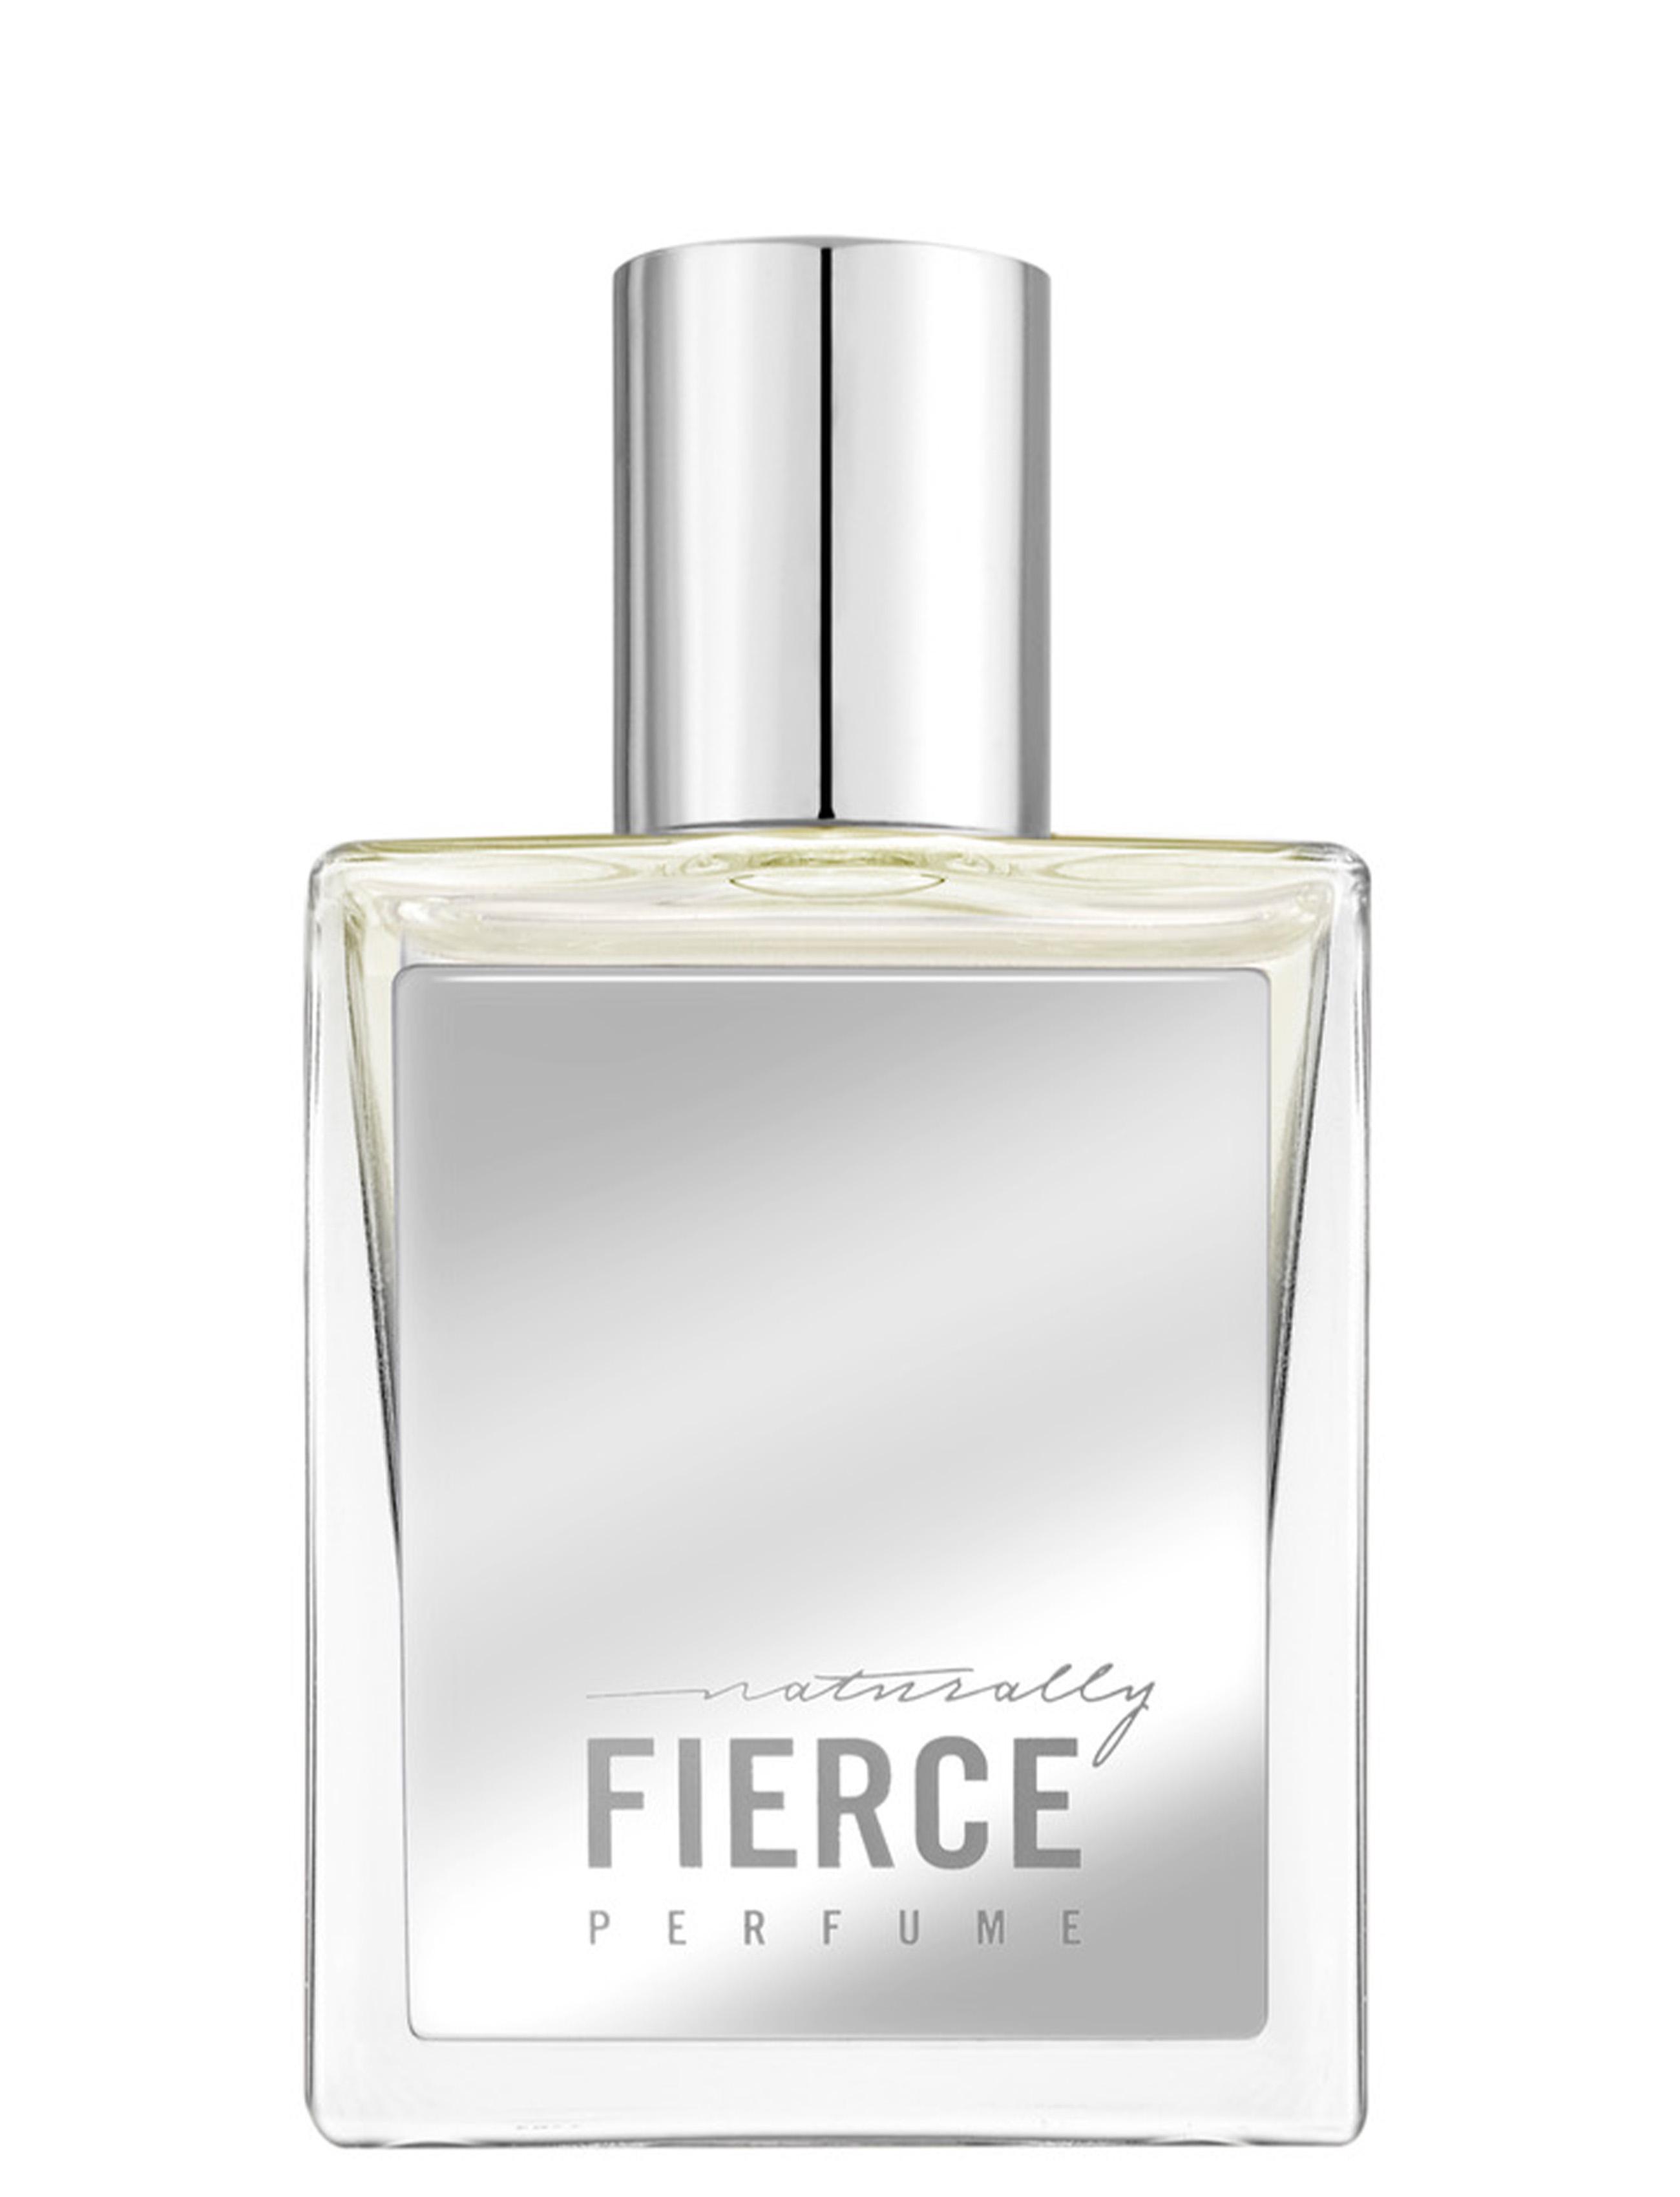 Abercrombie & Fitch Naturally Fierce Woman EDP, 30 ml